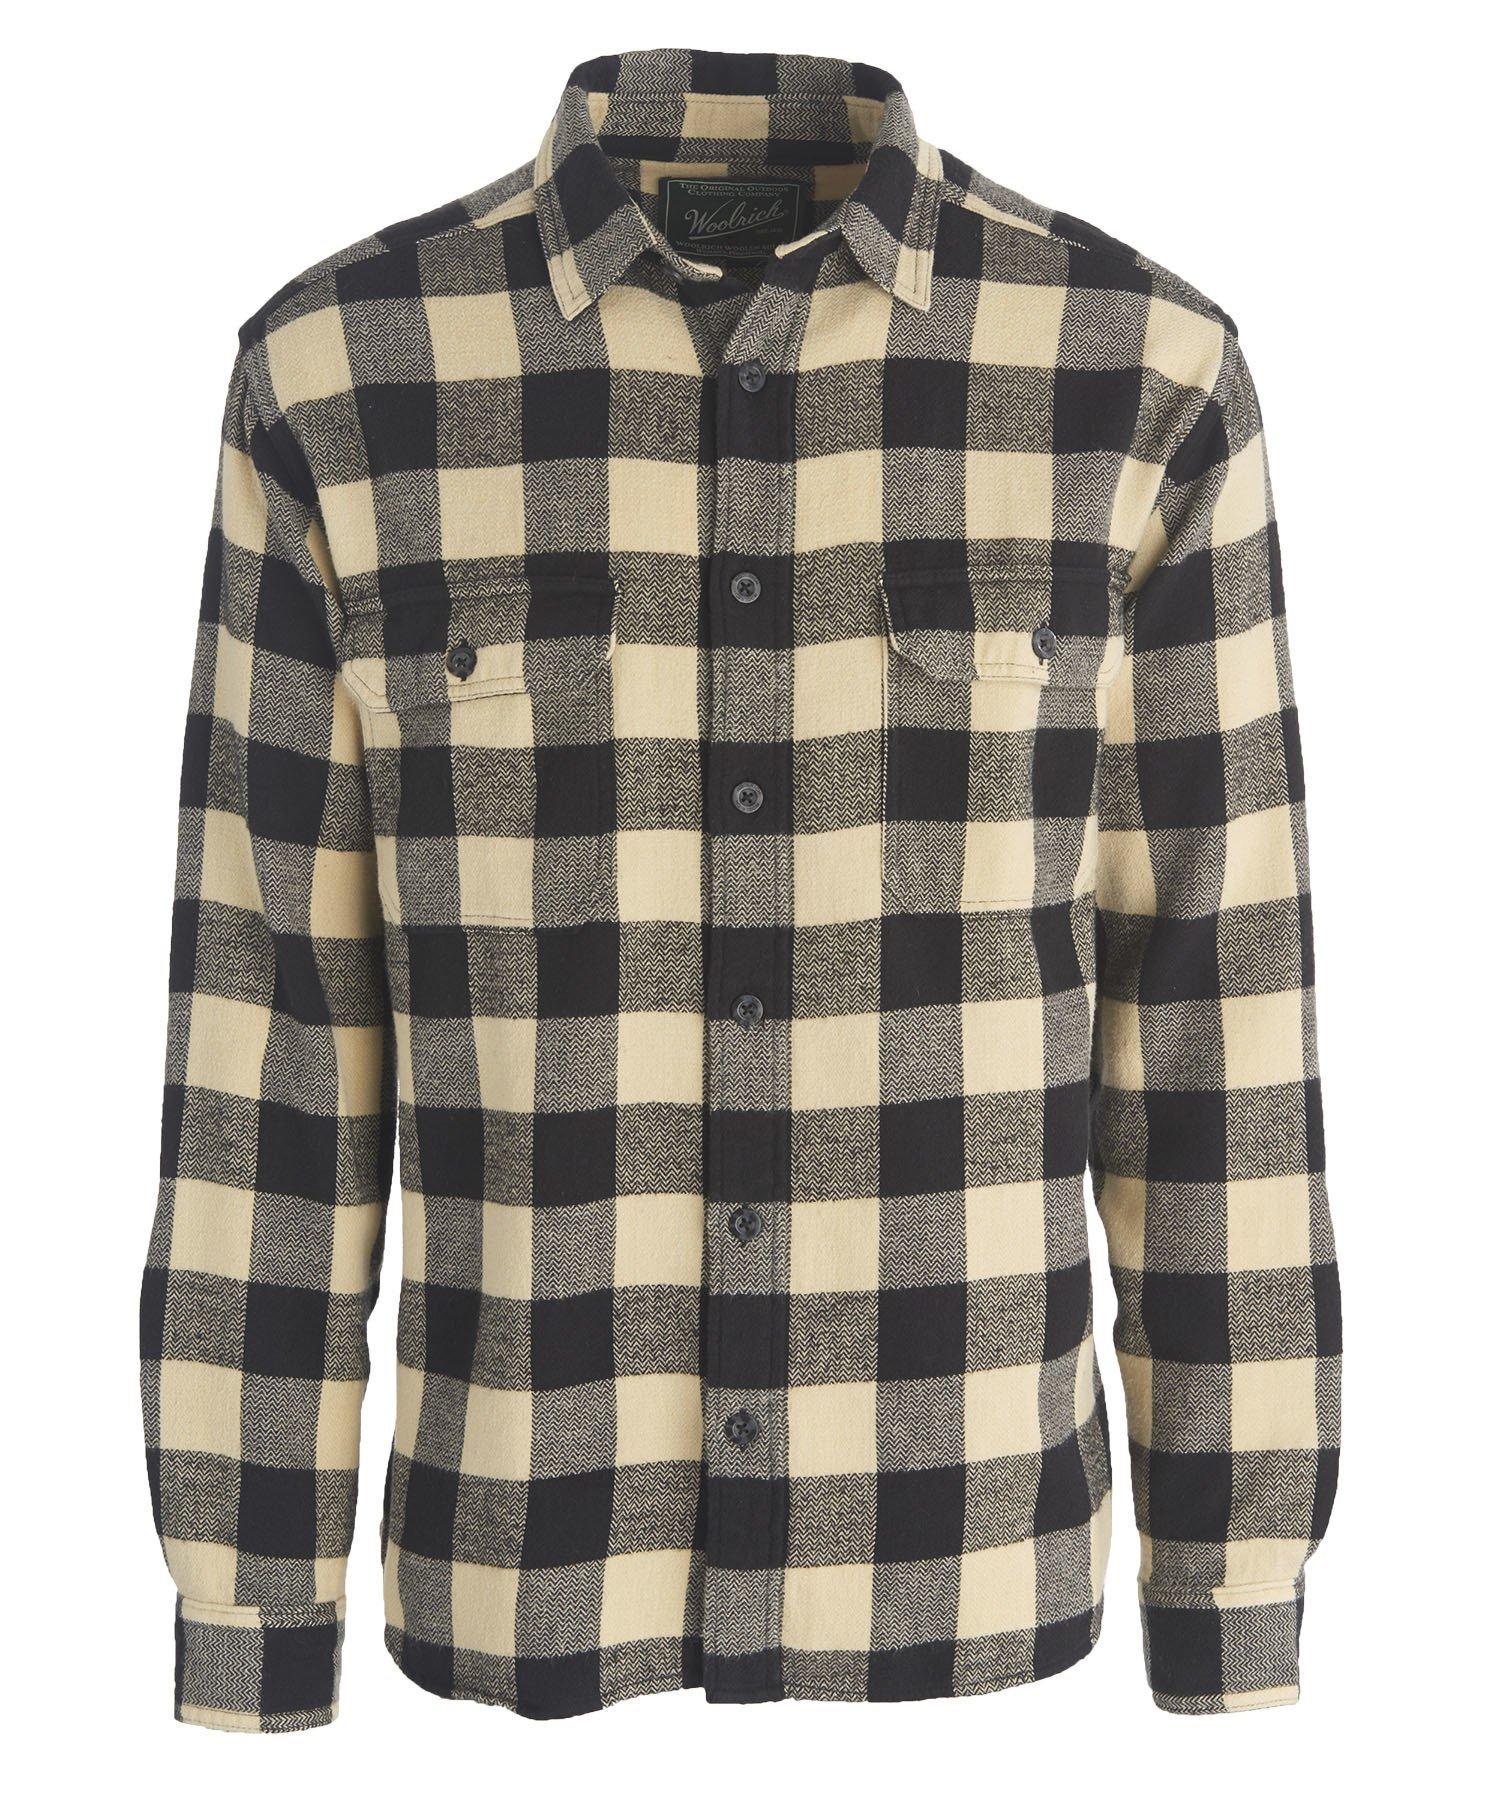 Woolrich Men's Oxbow Bend Flannel Shirt, Black Buffalo, Medium